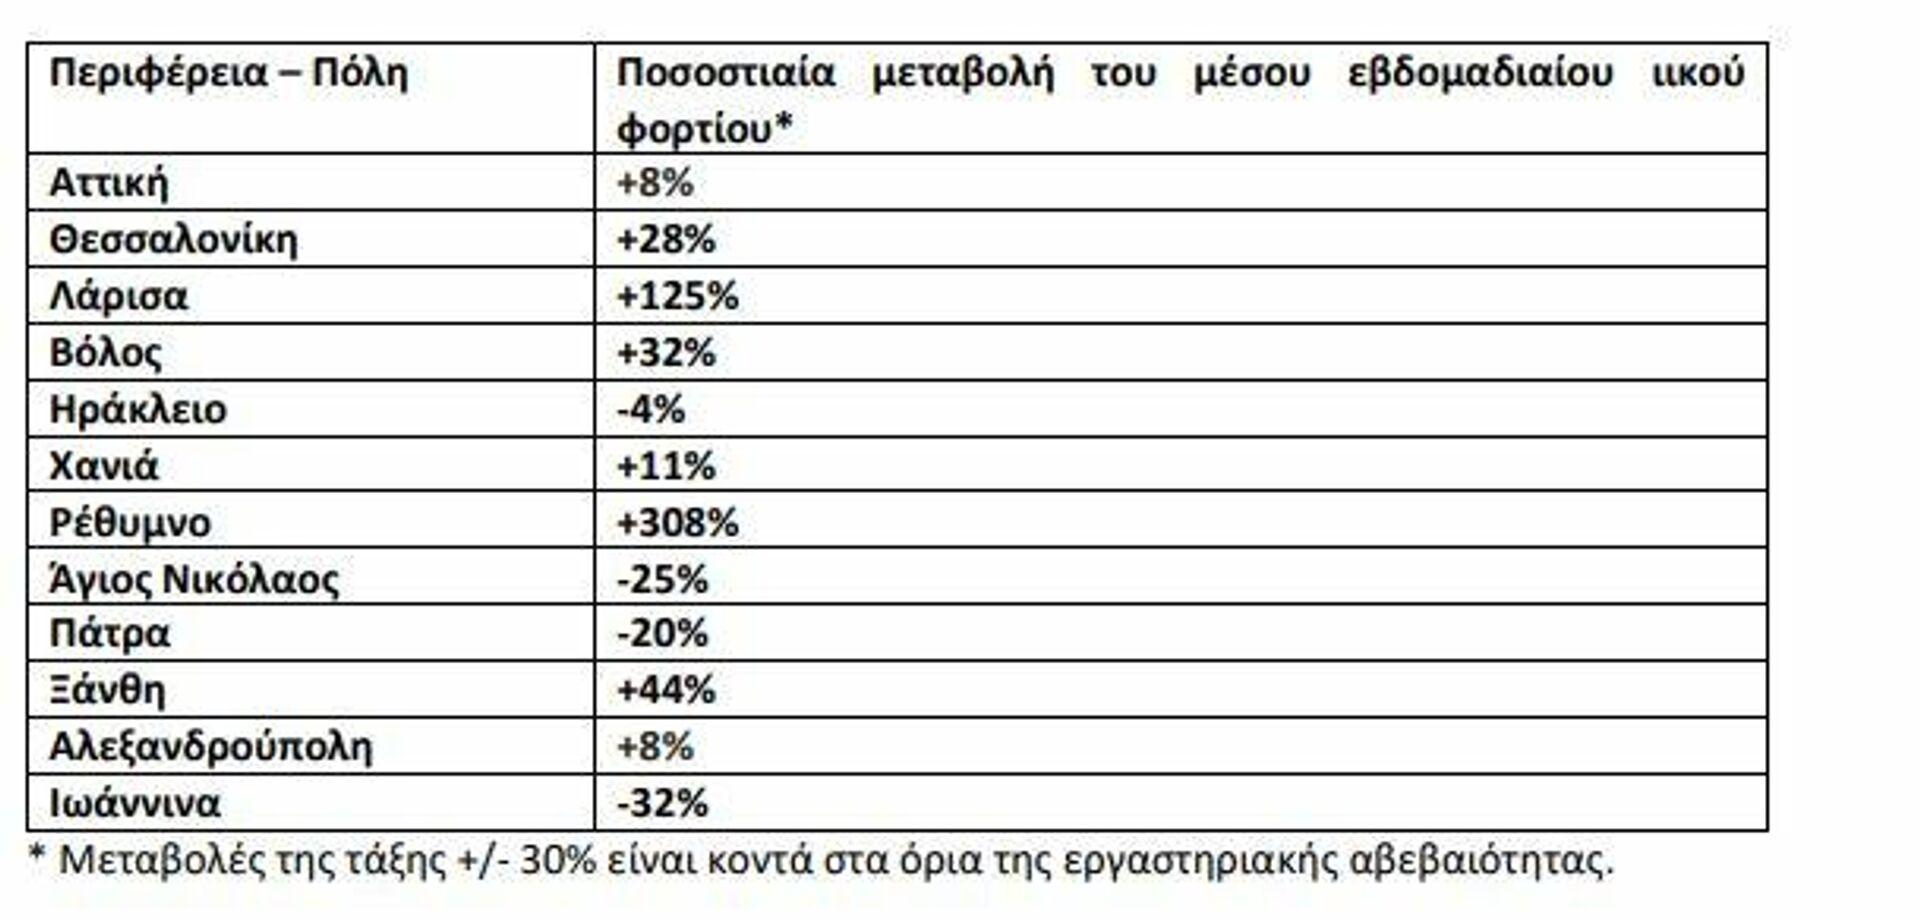 Aστικά λύματα την εβδομάδα 27 Σεπτεμβρίου – 3 Οκτωβρίου 2021 - Sputnik Ελλάδα, 1920, 05.10.2021